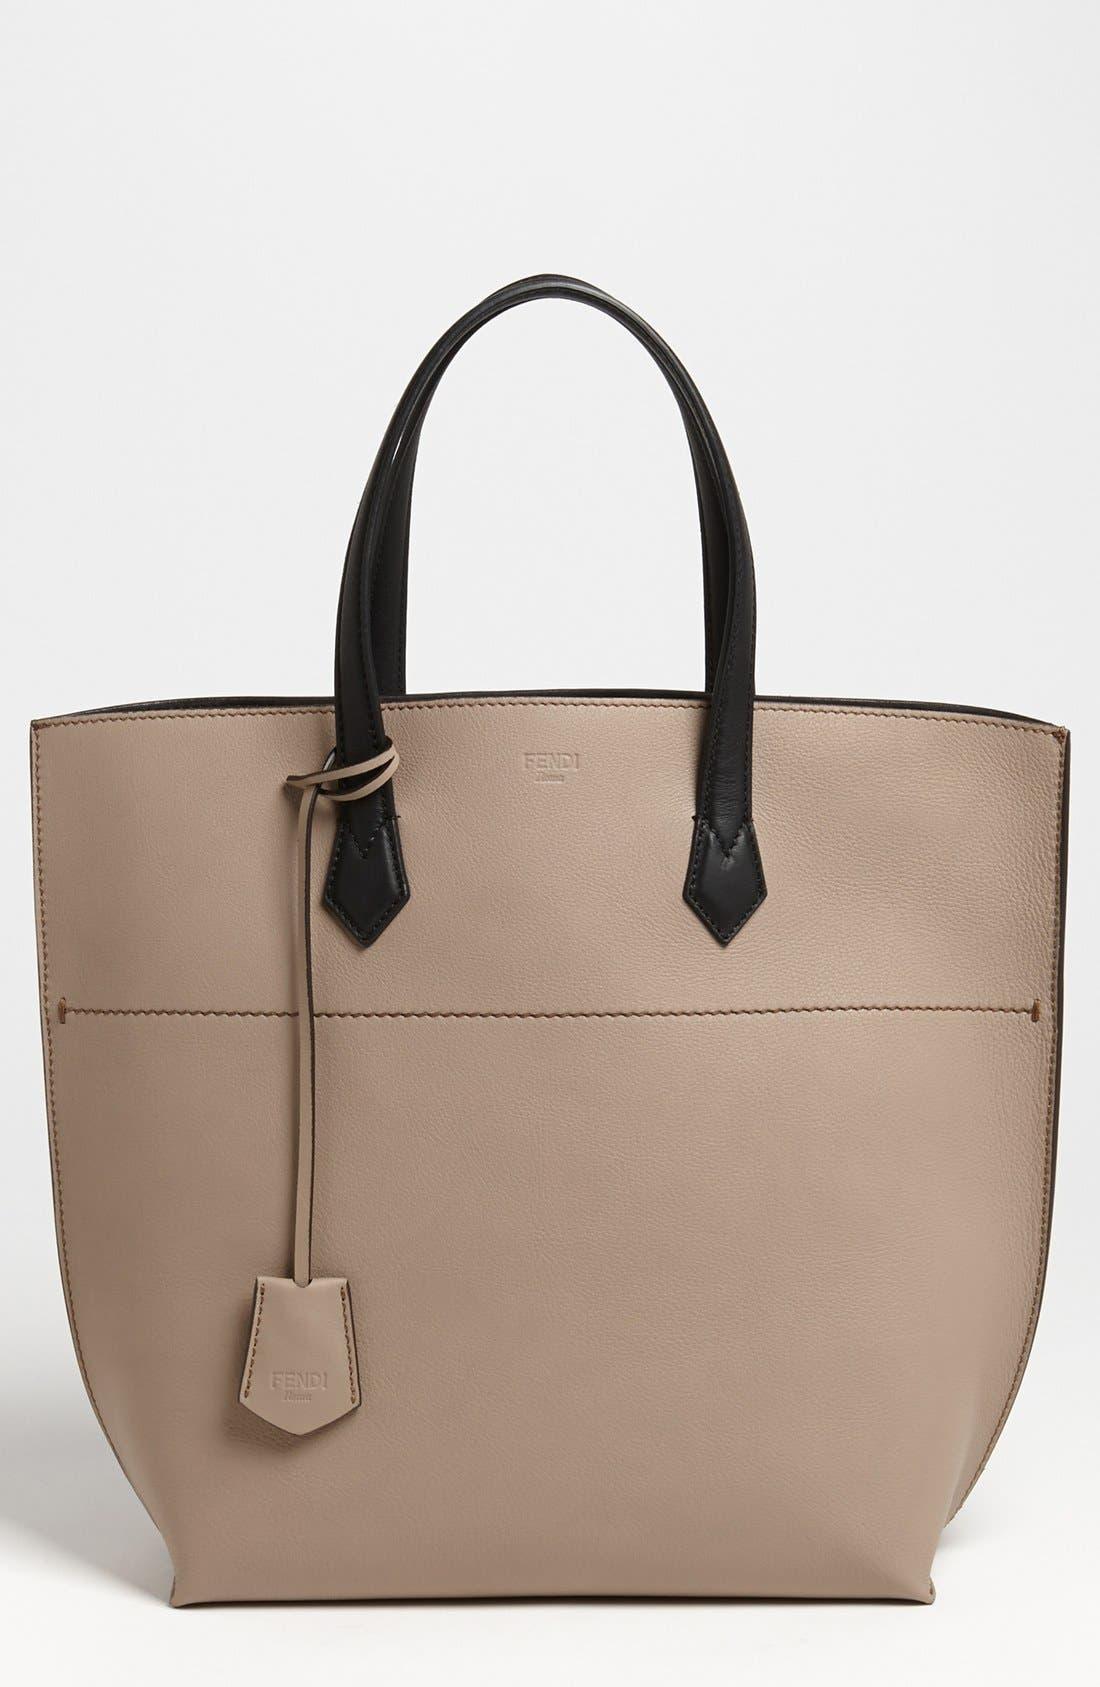 Main Image - Fendi 'All In' Leather Shopper